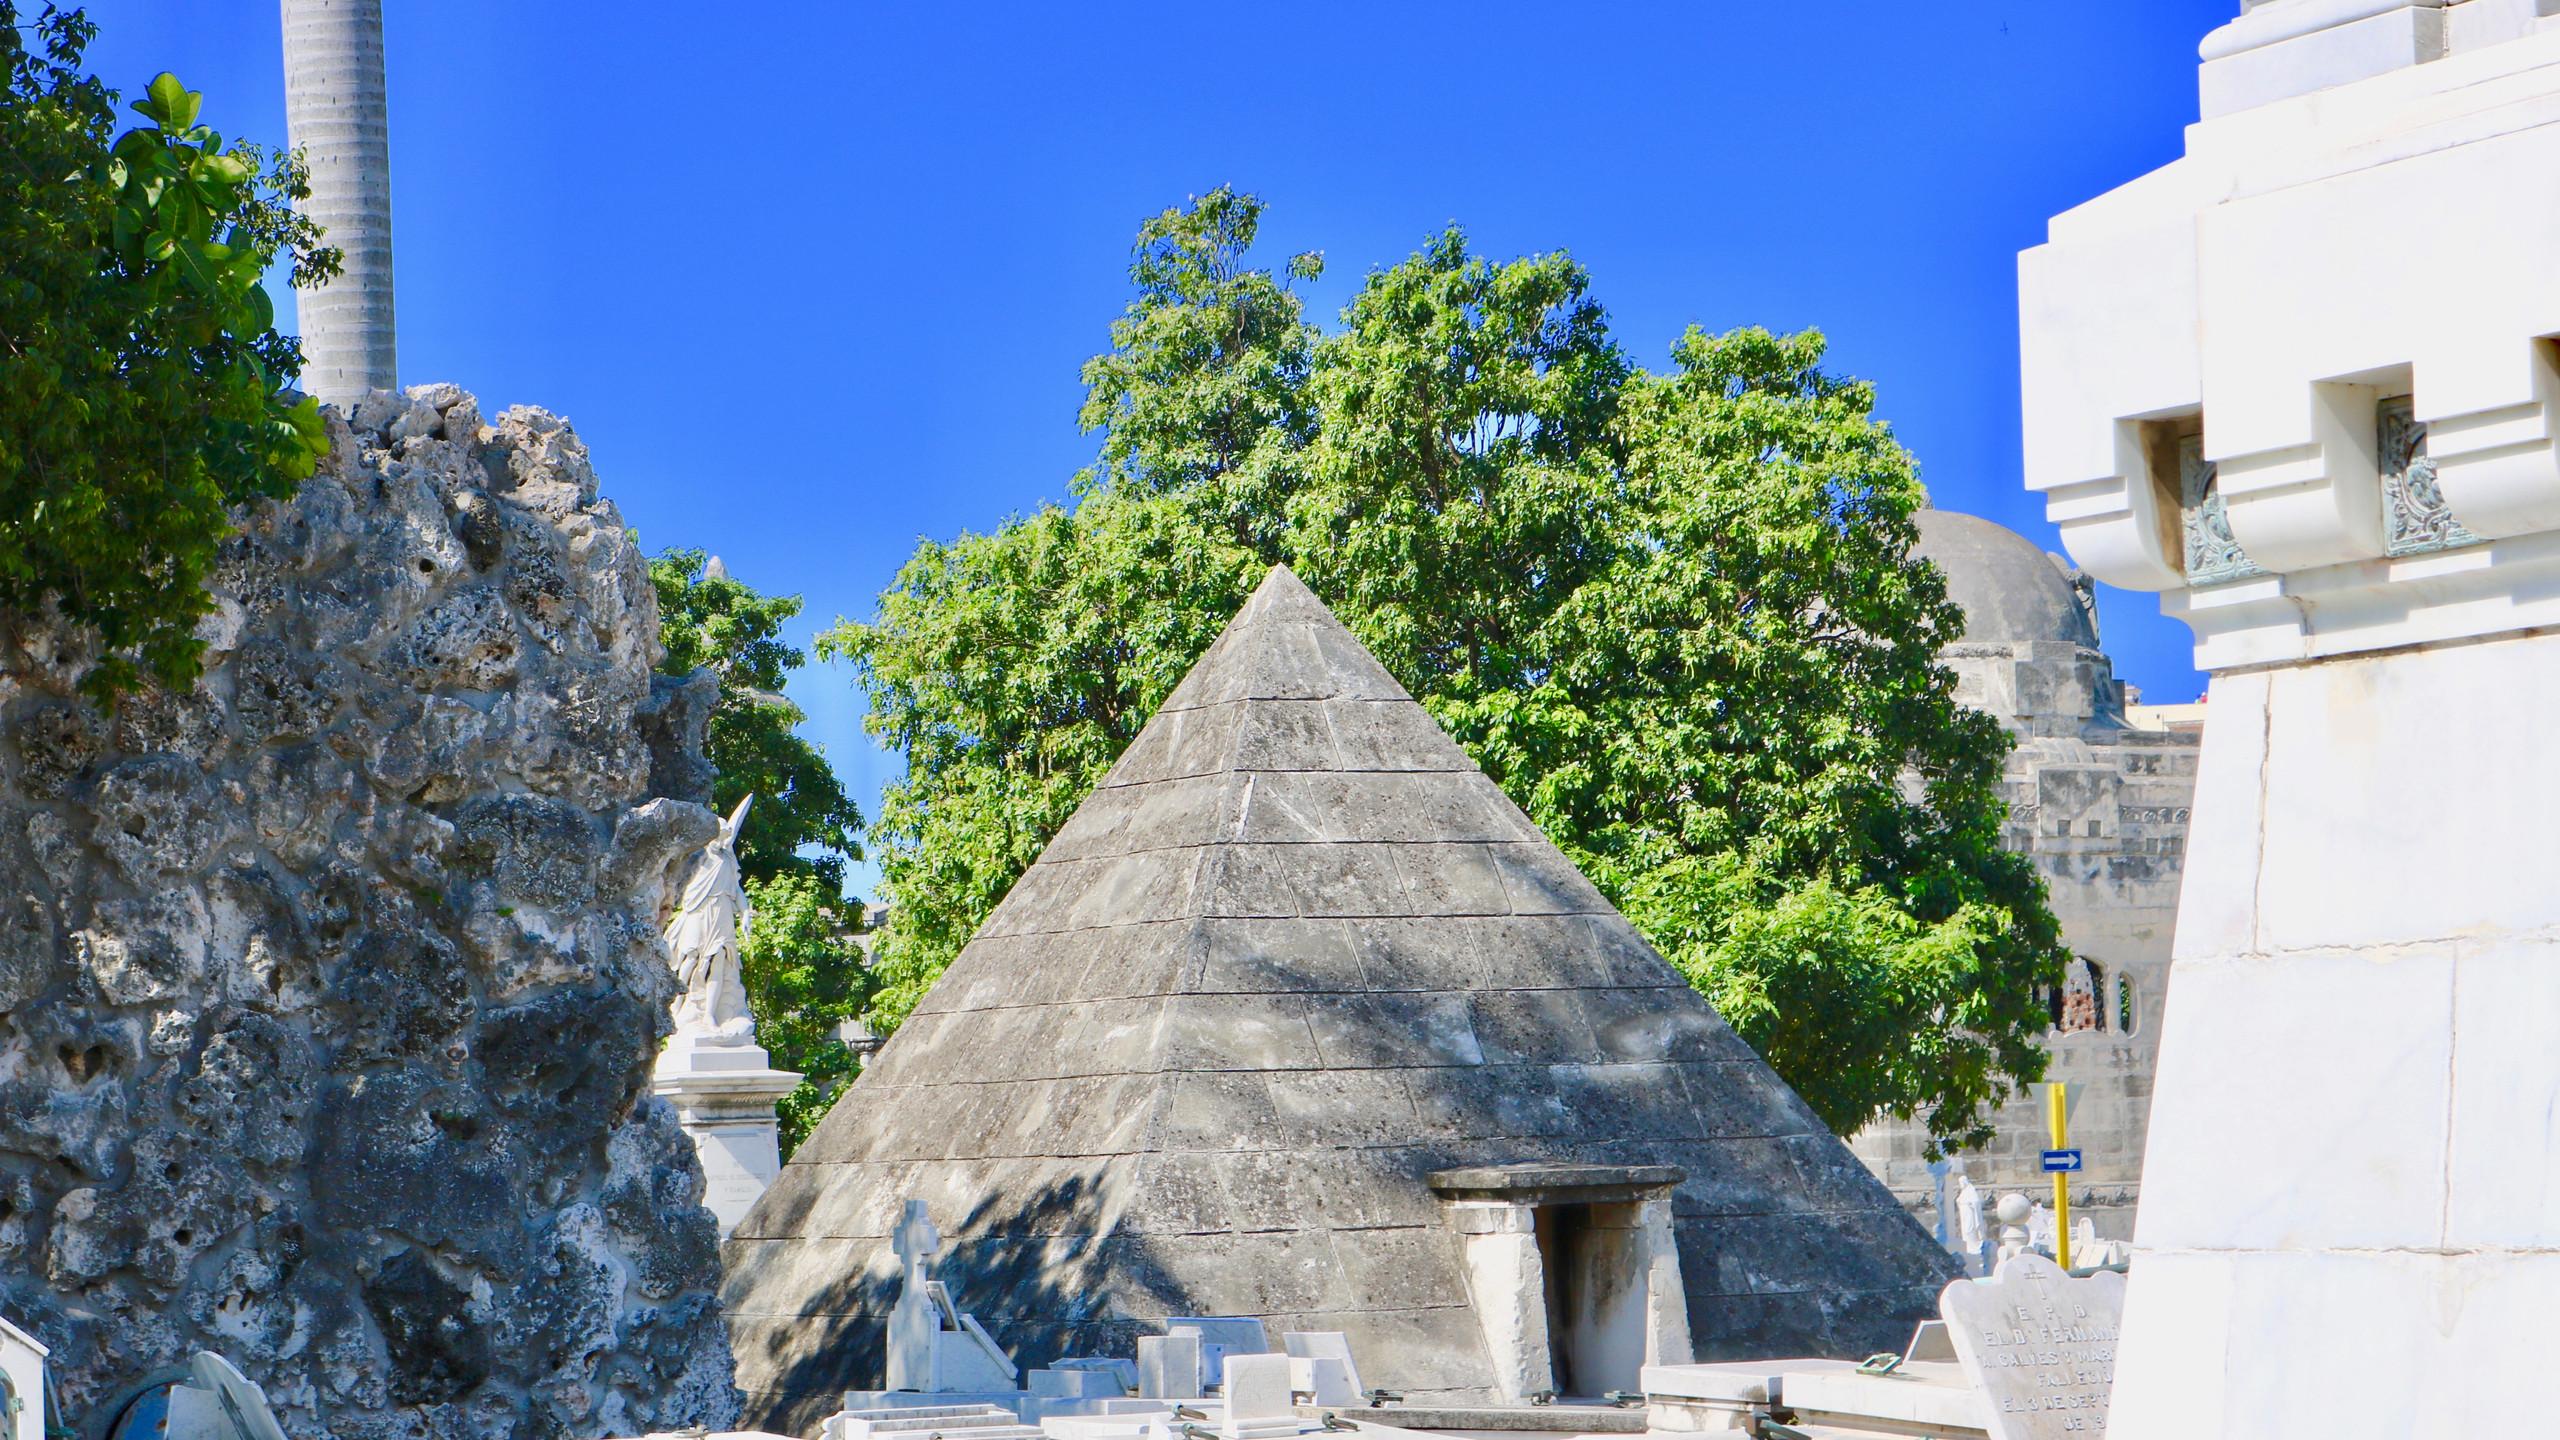 Pyramid shaped mausoleum in Havana, Cuba's Colon Cemetery.